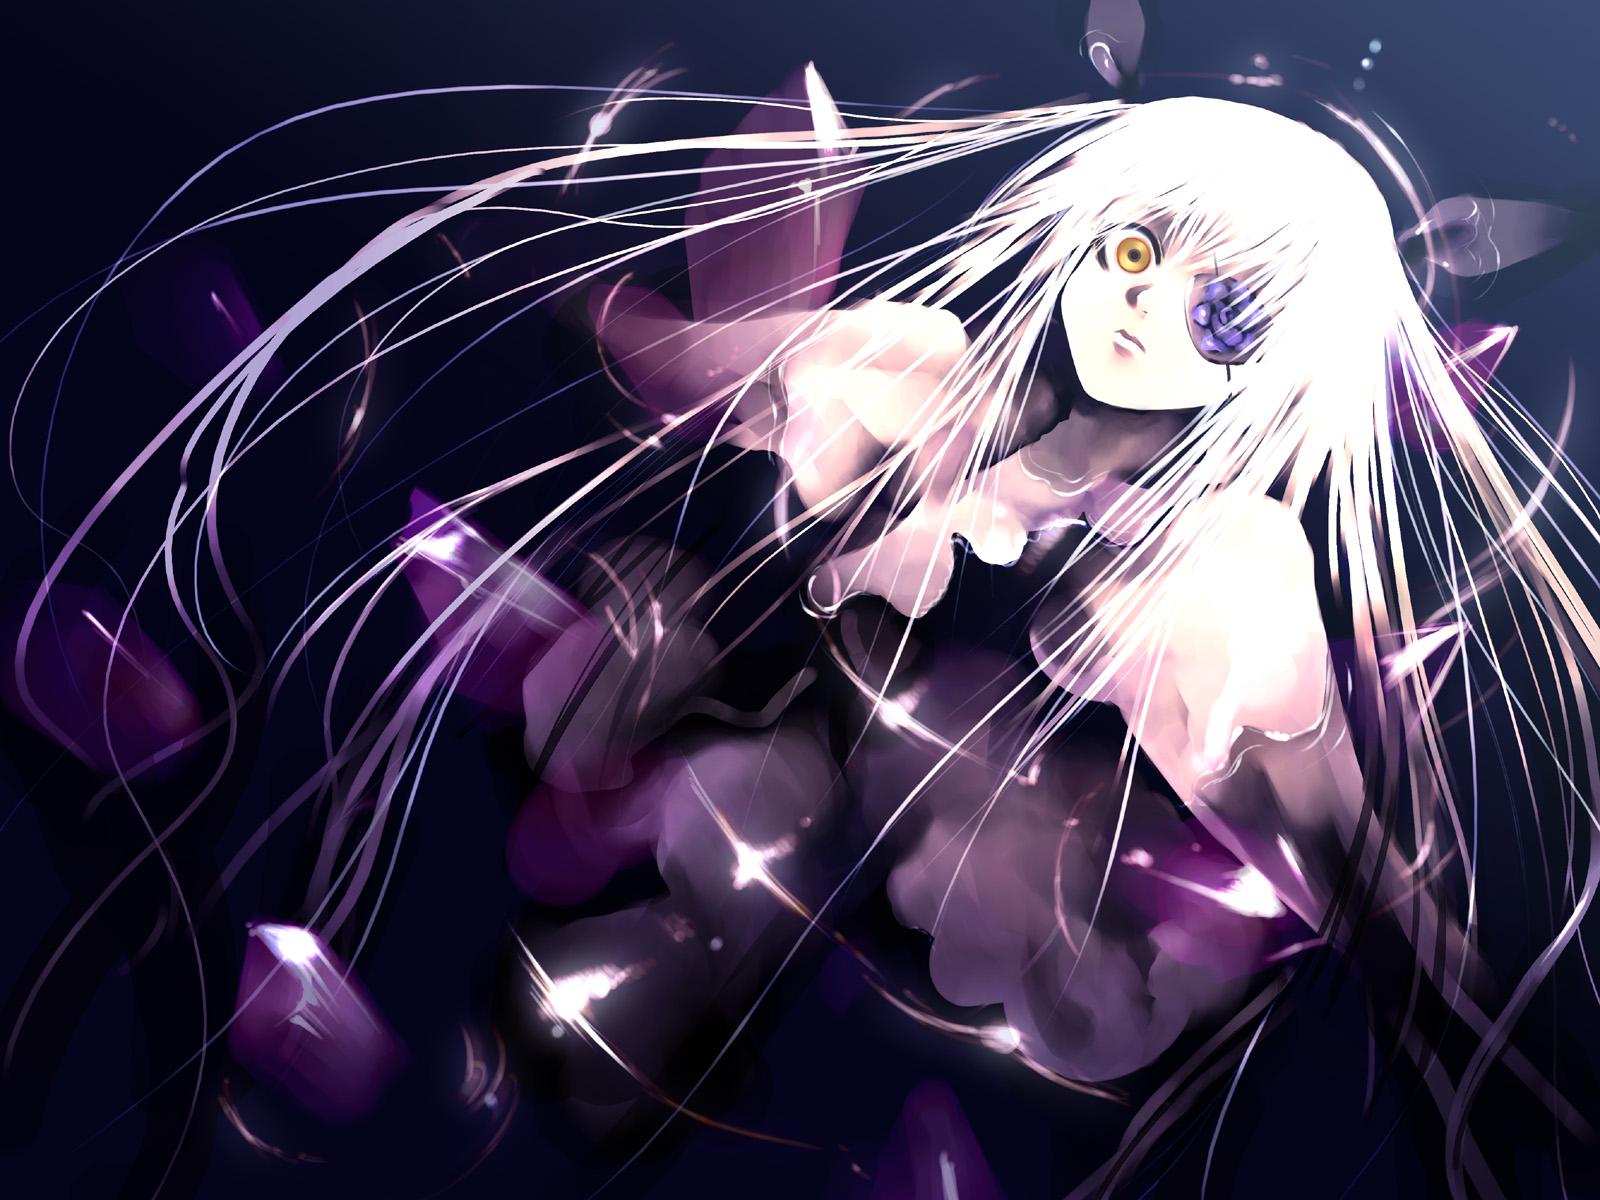 barasuishou eyepatch kei_(artist) purple rozen_maiden